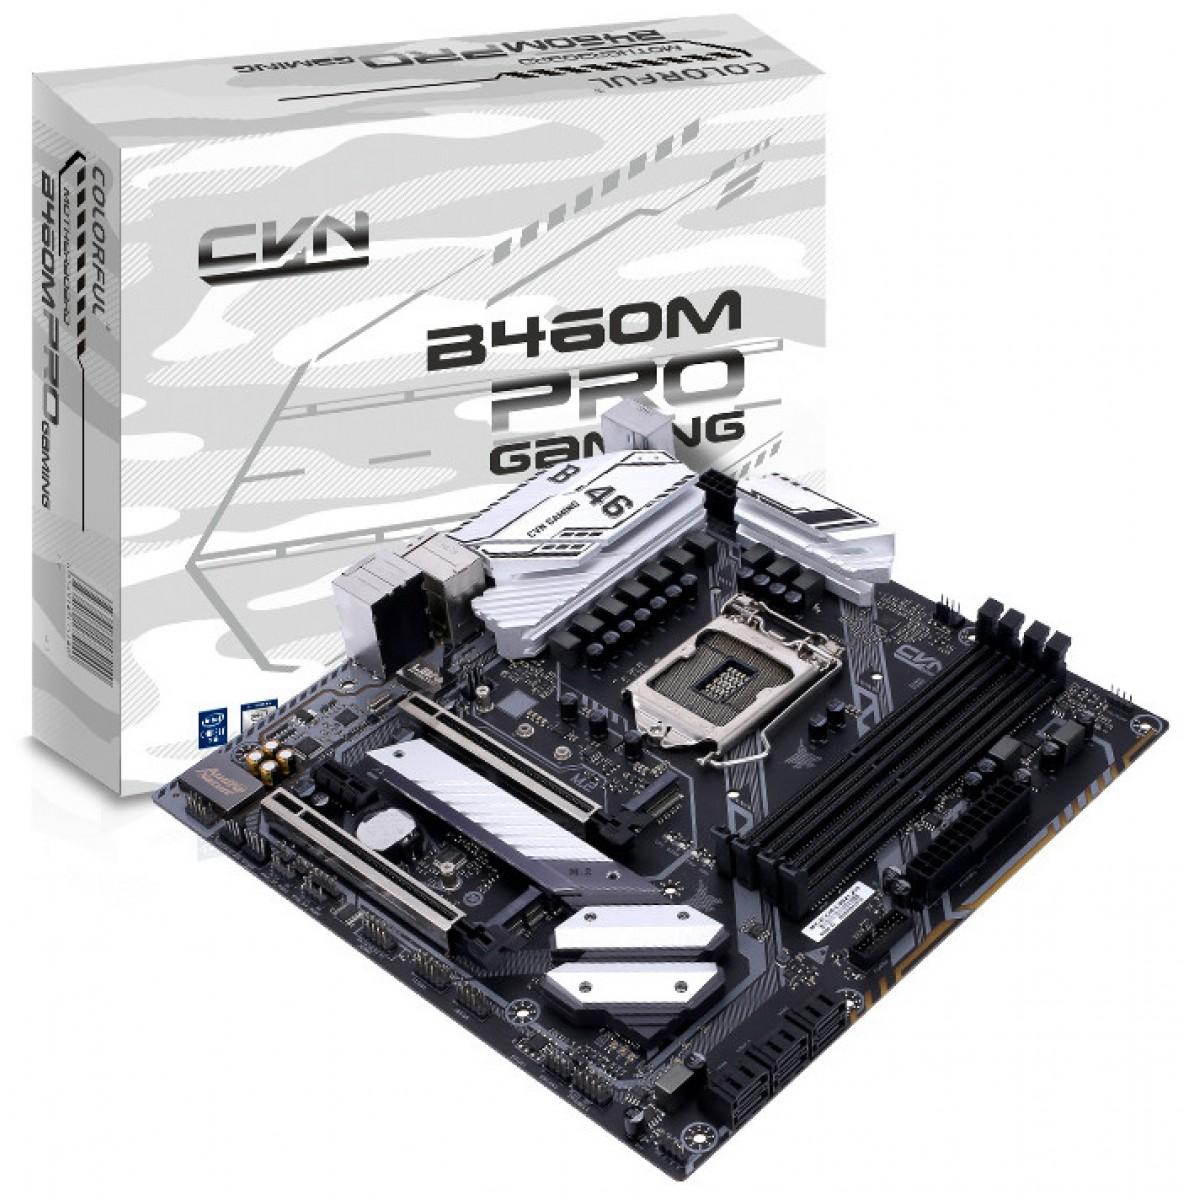 Placa Mãe Colorful CVN B460M GAMING PRO V20, Chipset B460, Intel LGA 1200, AXT, DDR4, 110013207701